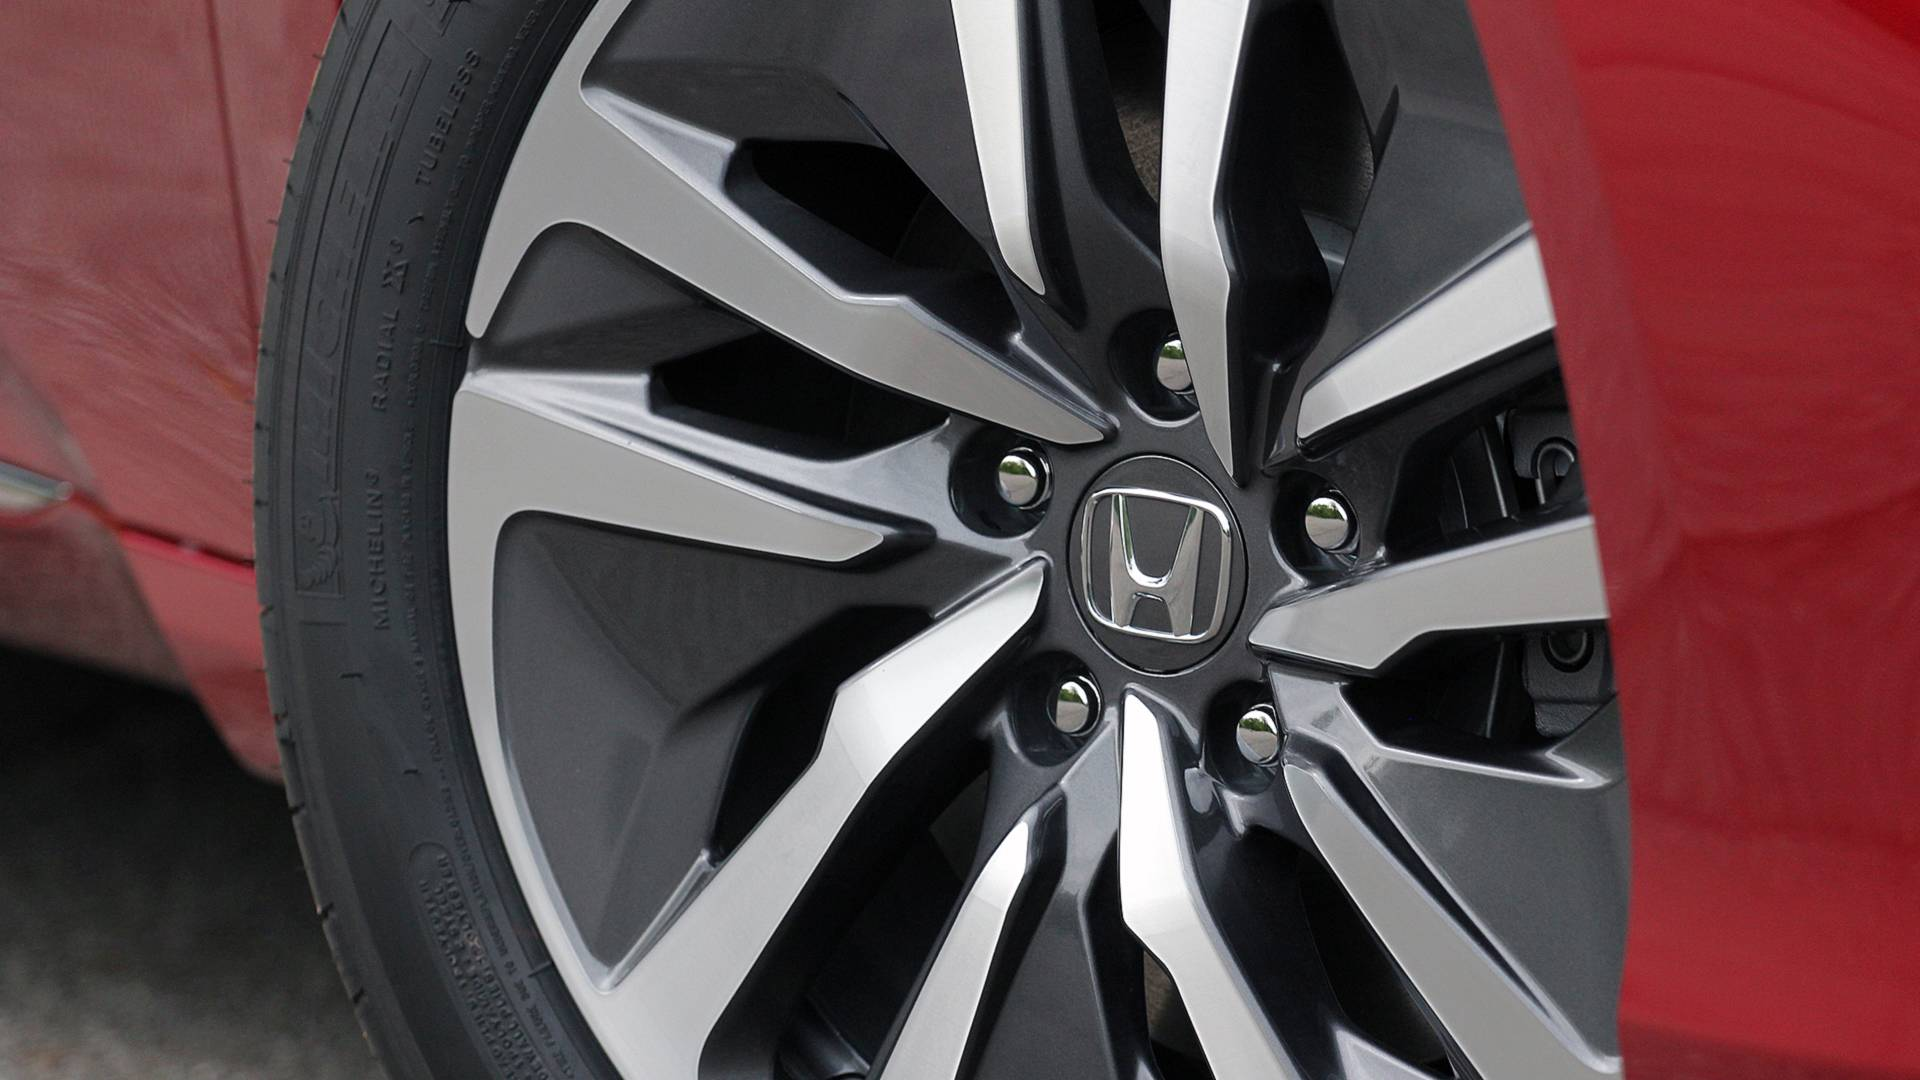 2018-honda-accord-hybrid-danh-gia-6.jpg